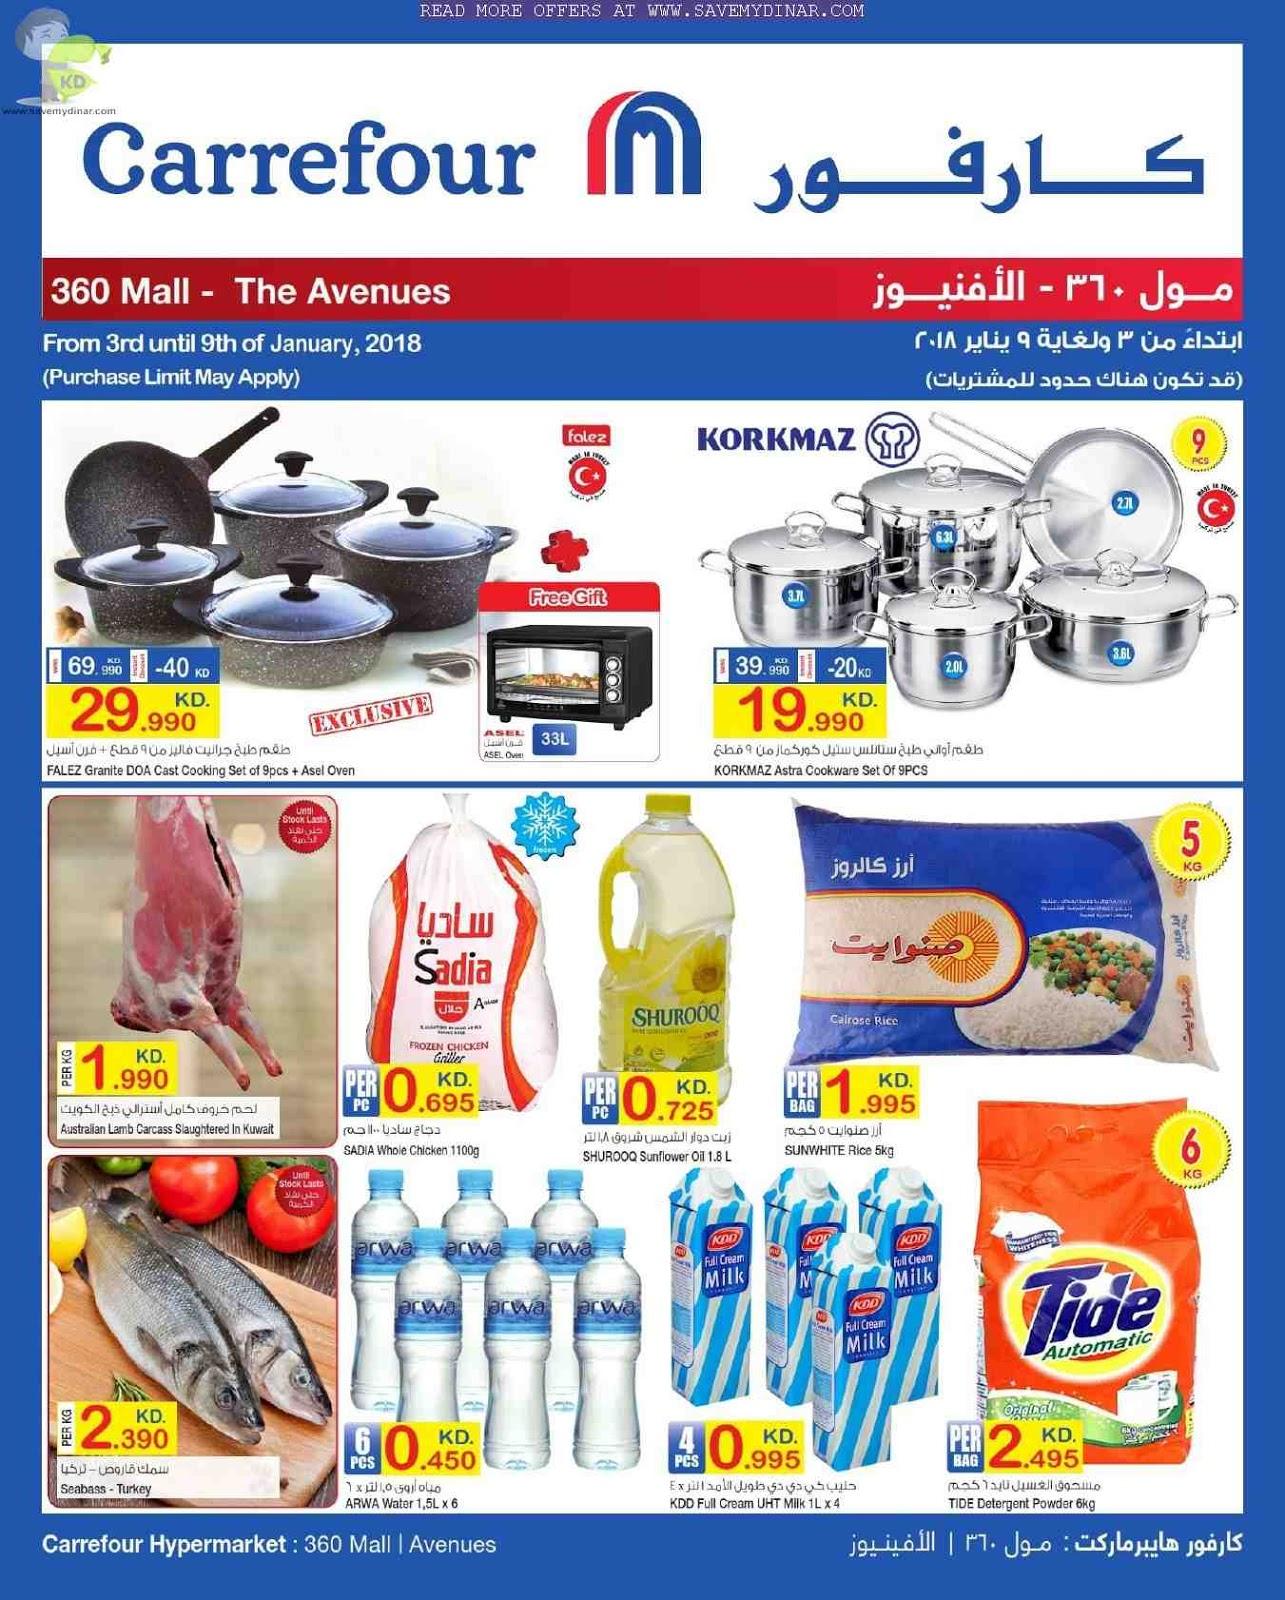 Carrefour Kuwait - New Latest Promotions   SaveMyDinar